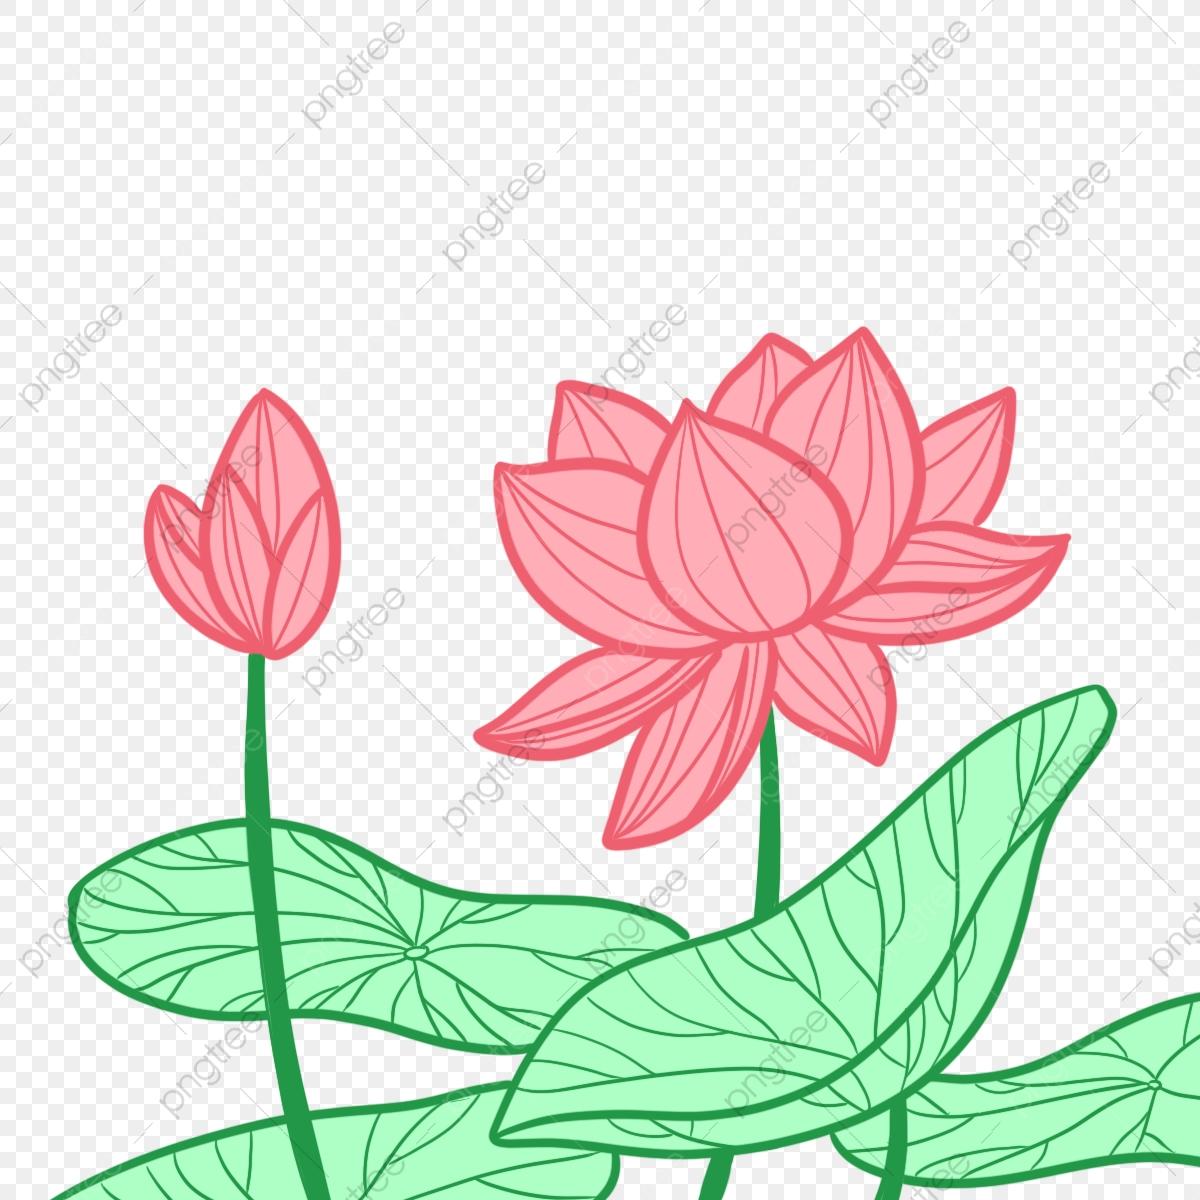 Lotus clipart cute. Hand drawn family aquatic